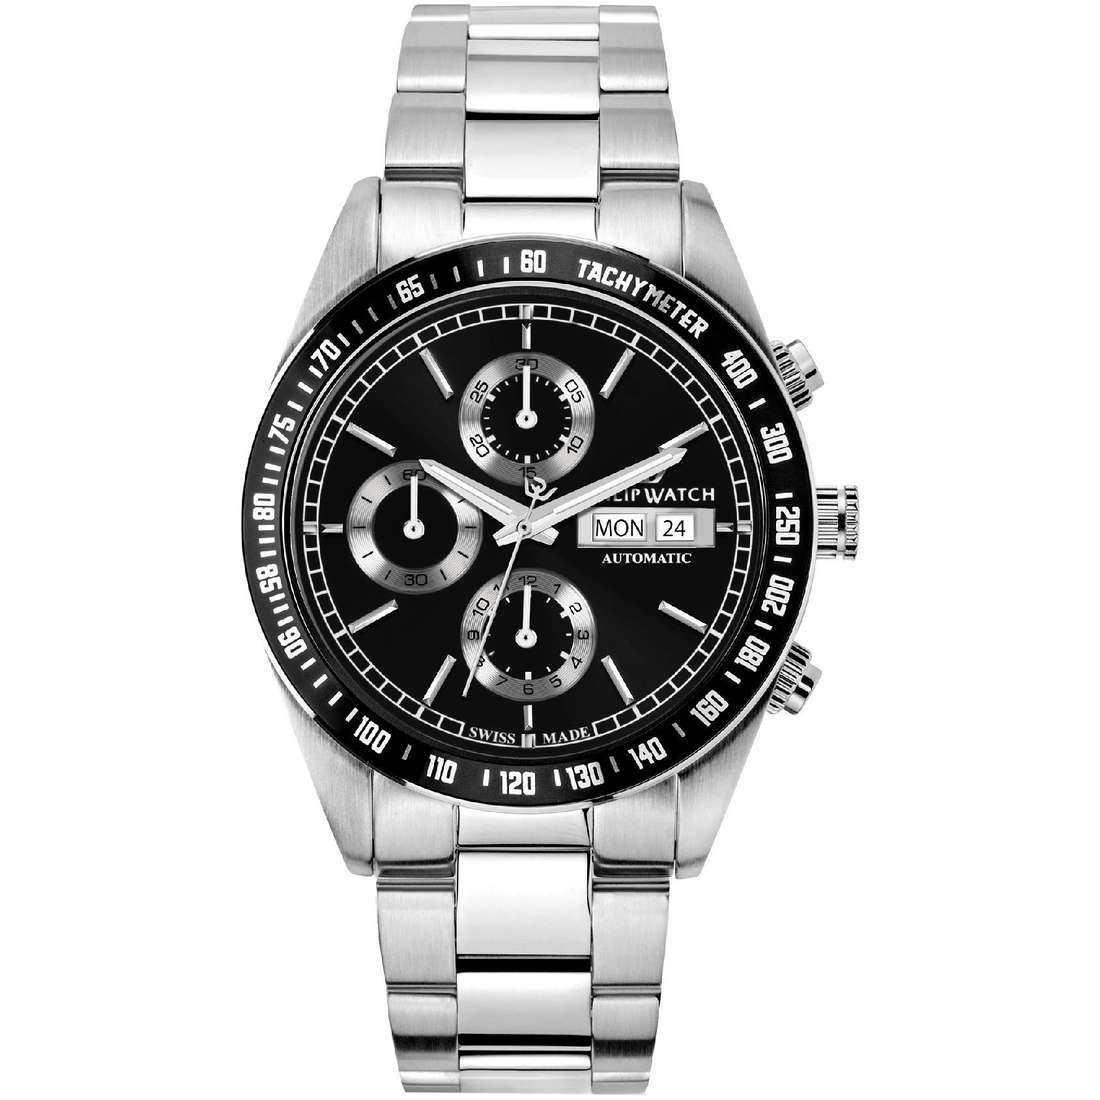 Orologio philip watch r8243607001